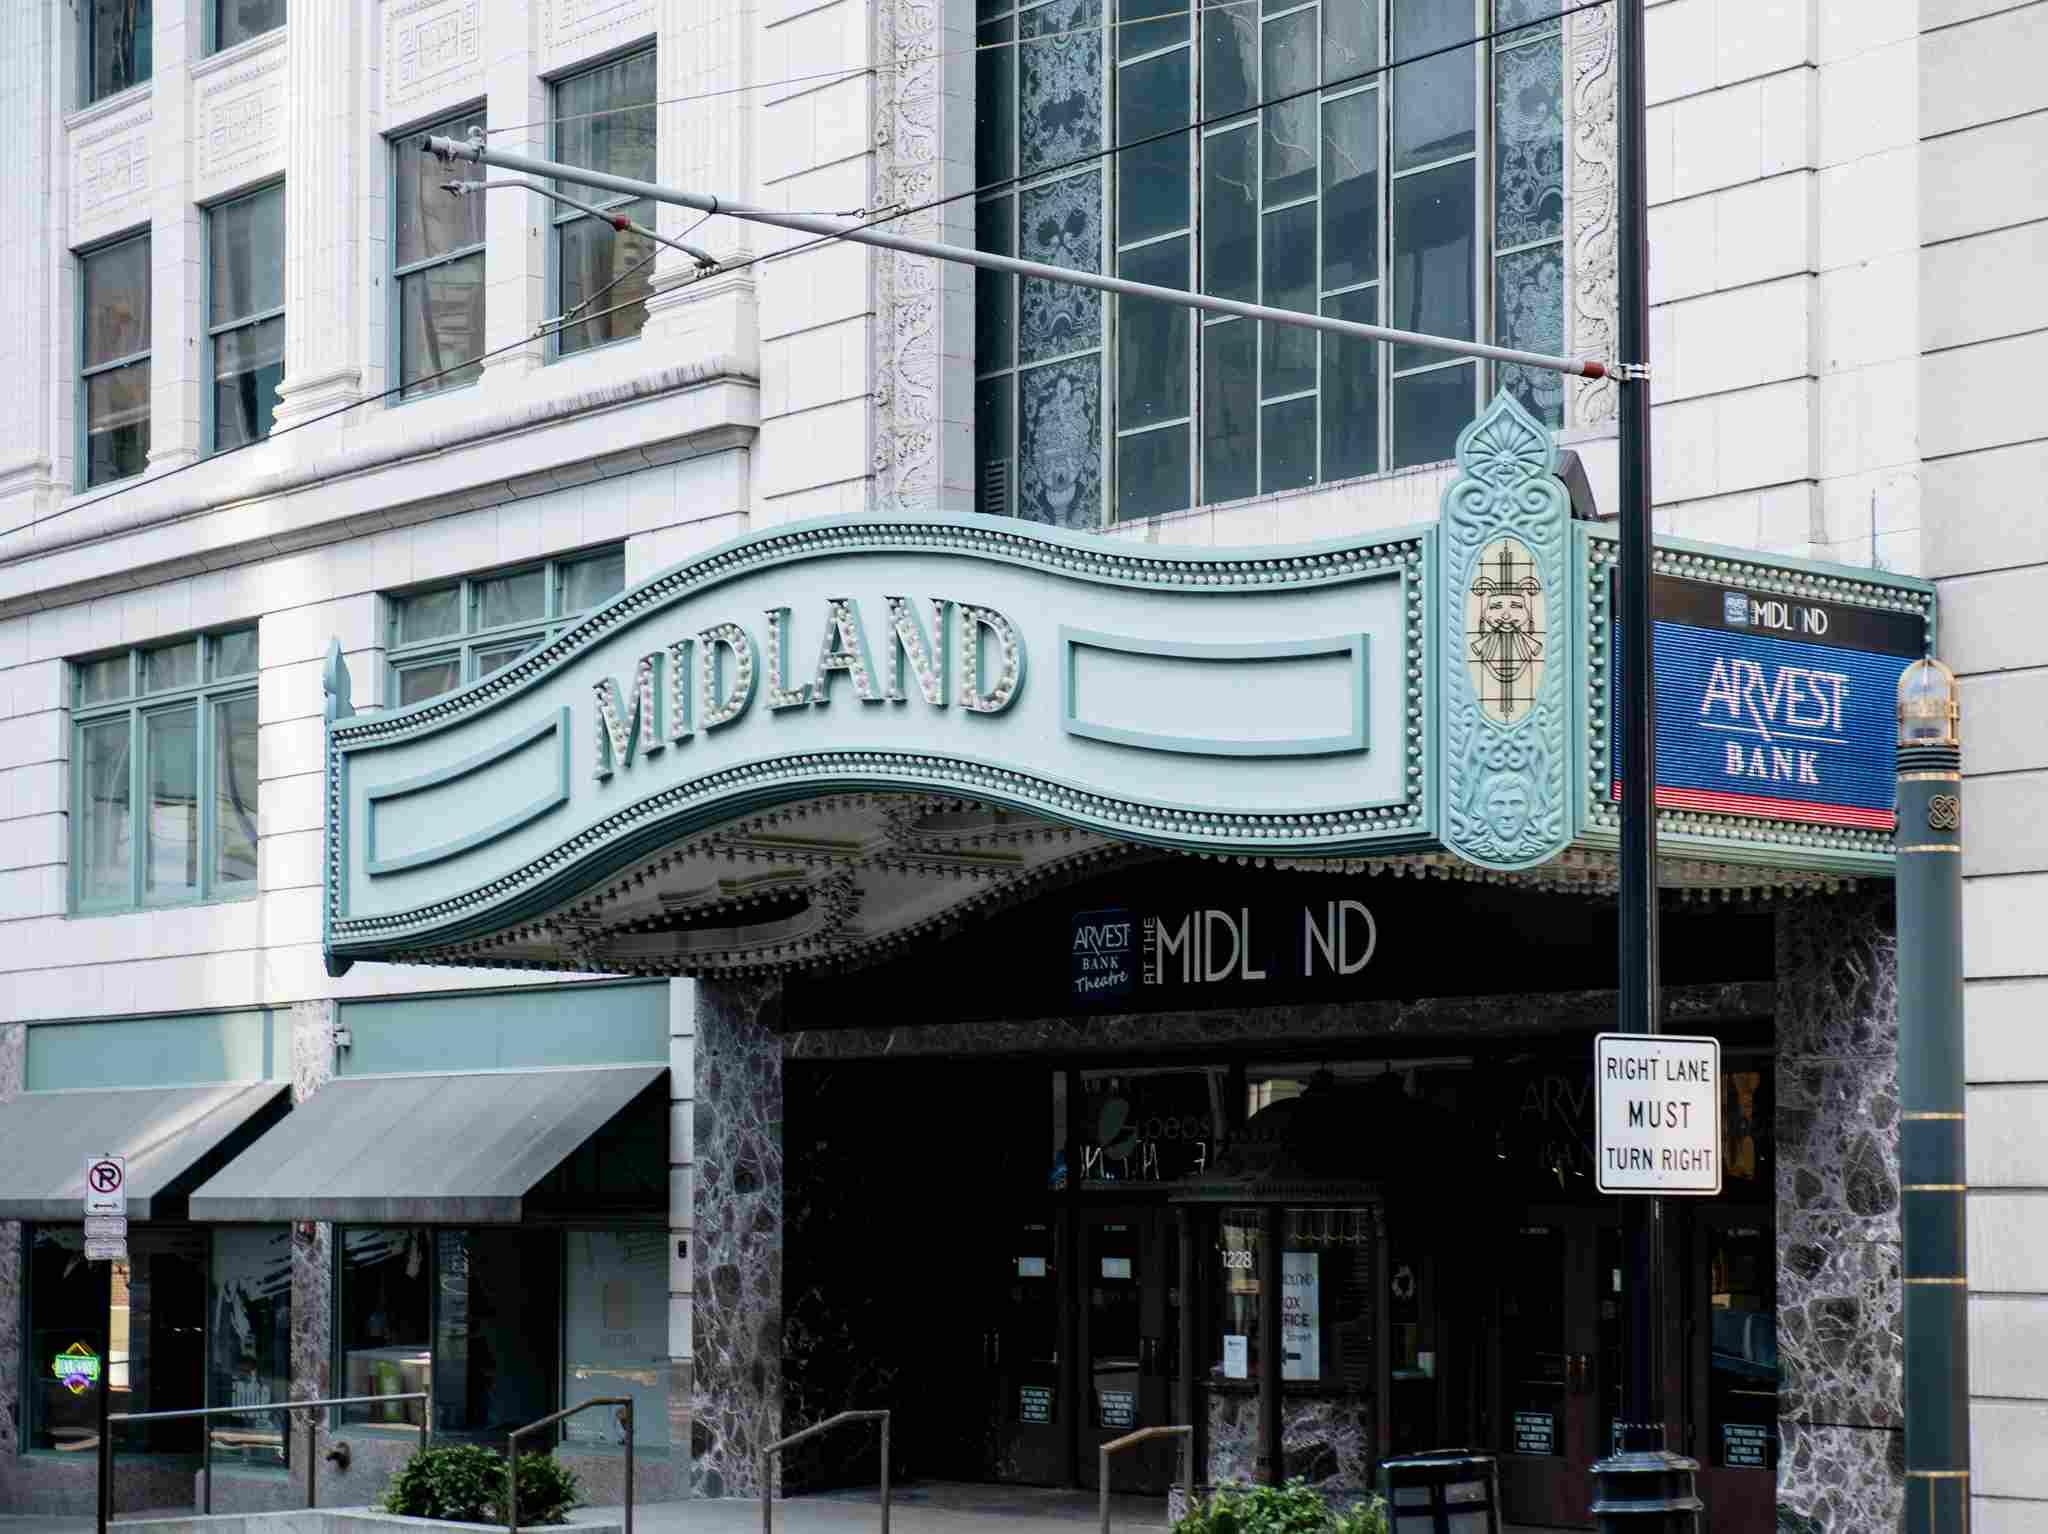 Arvest Bank Theatre at the Midland. Kansas City